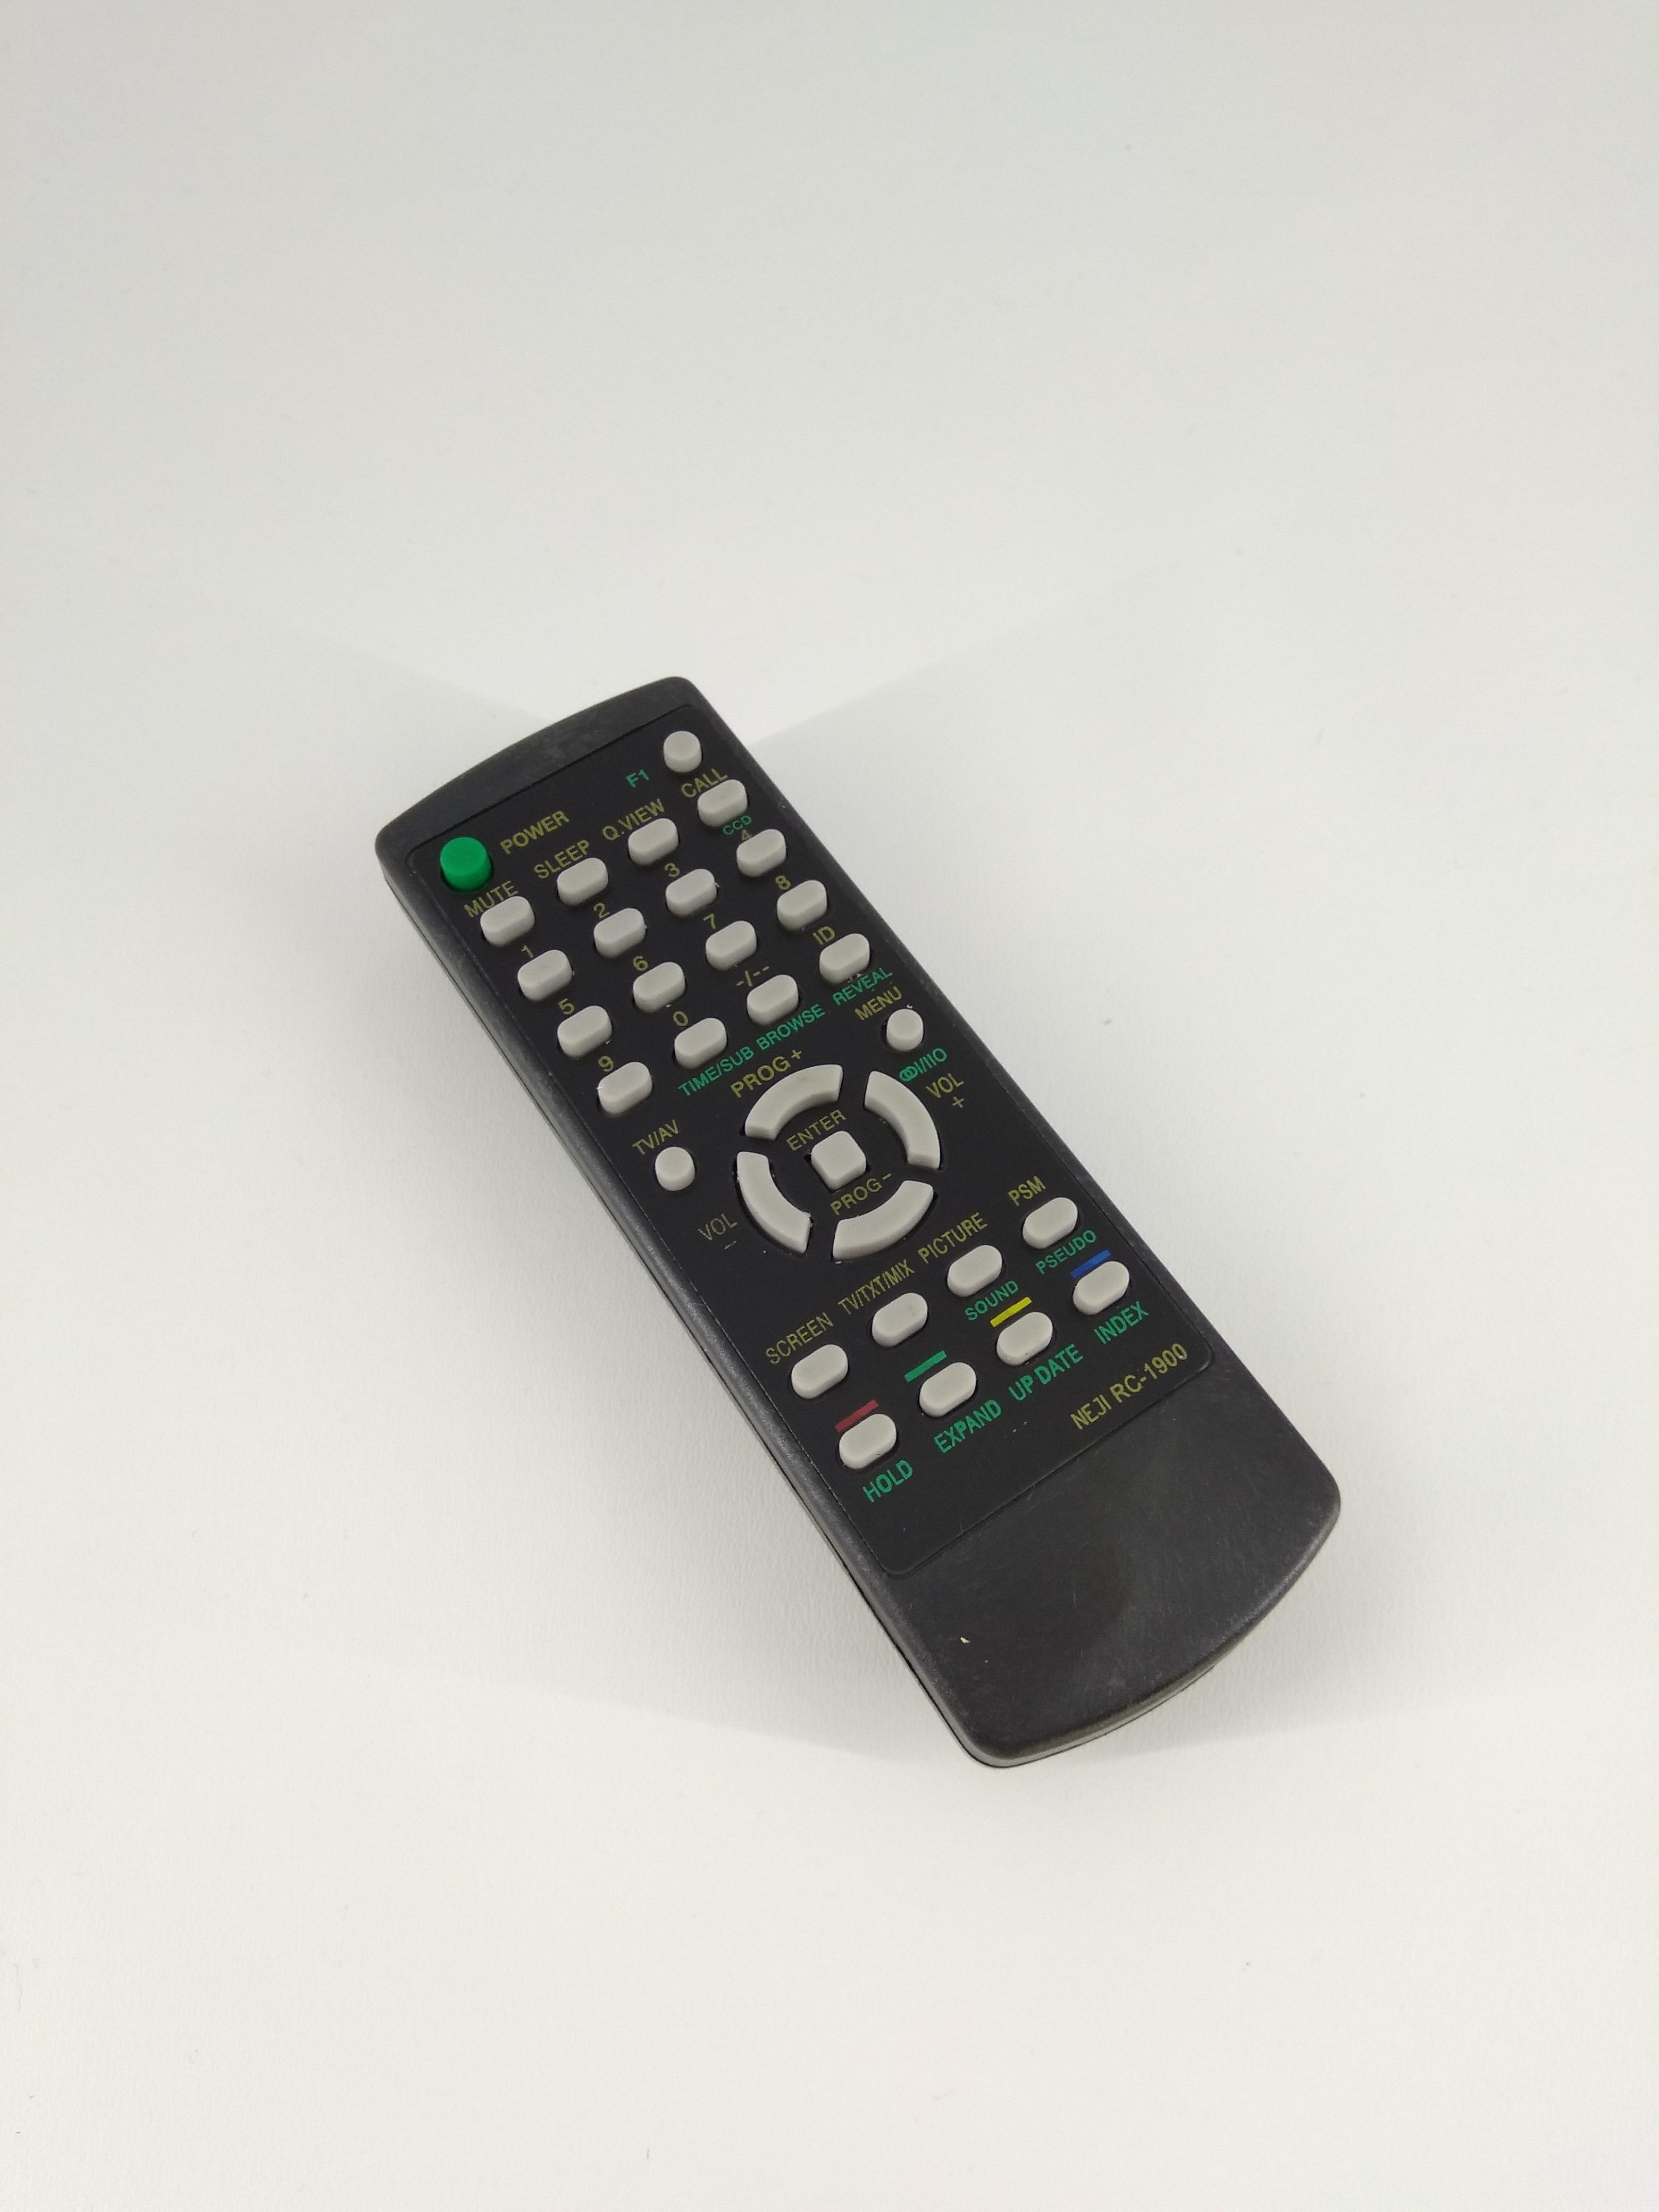 Remot Remote TV Akari Tabung RC-1900 Original Pabrik / KW